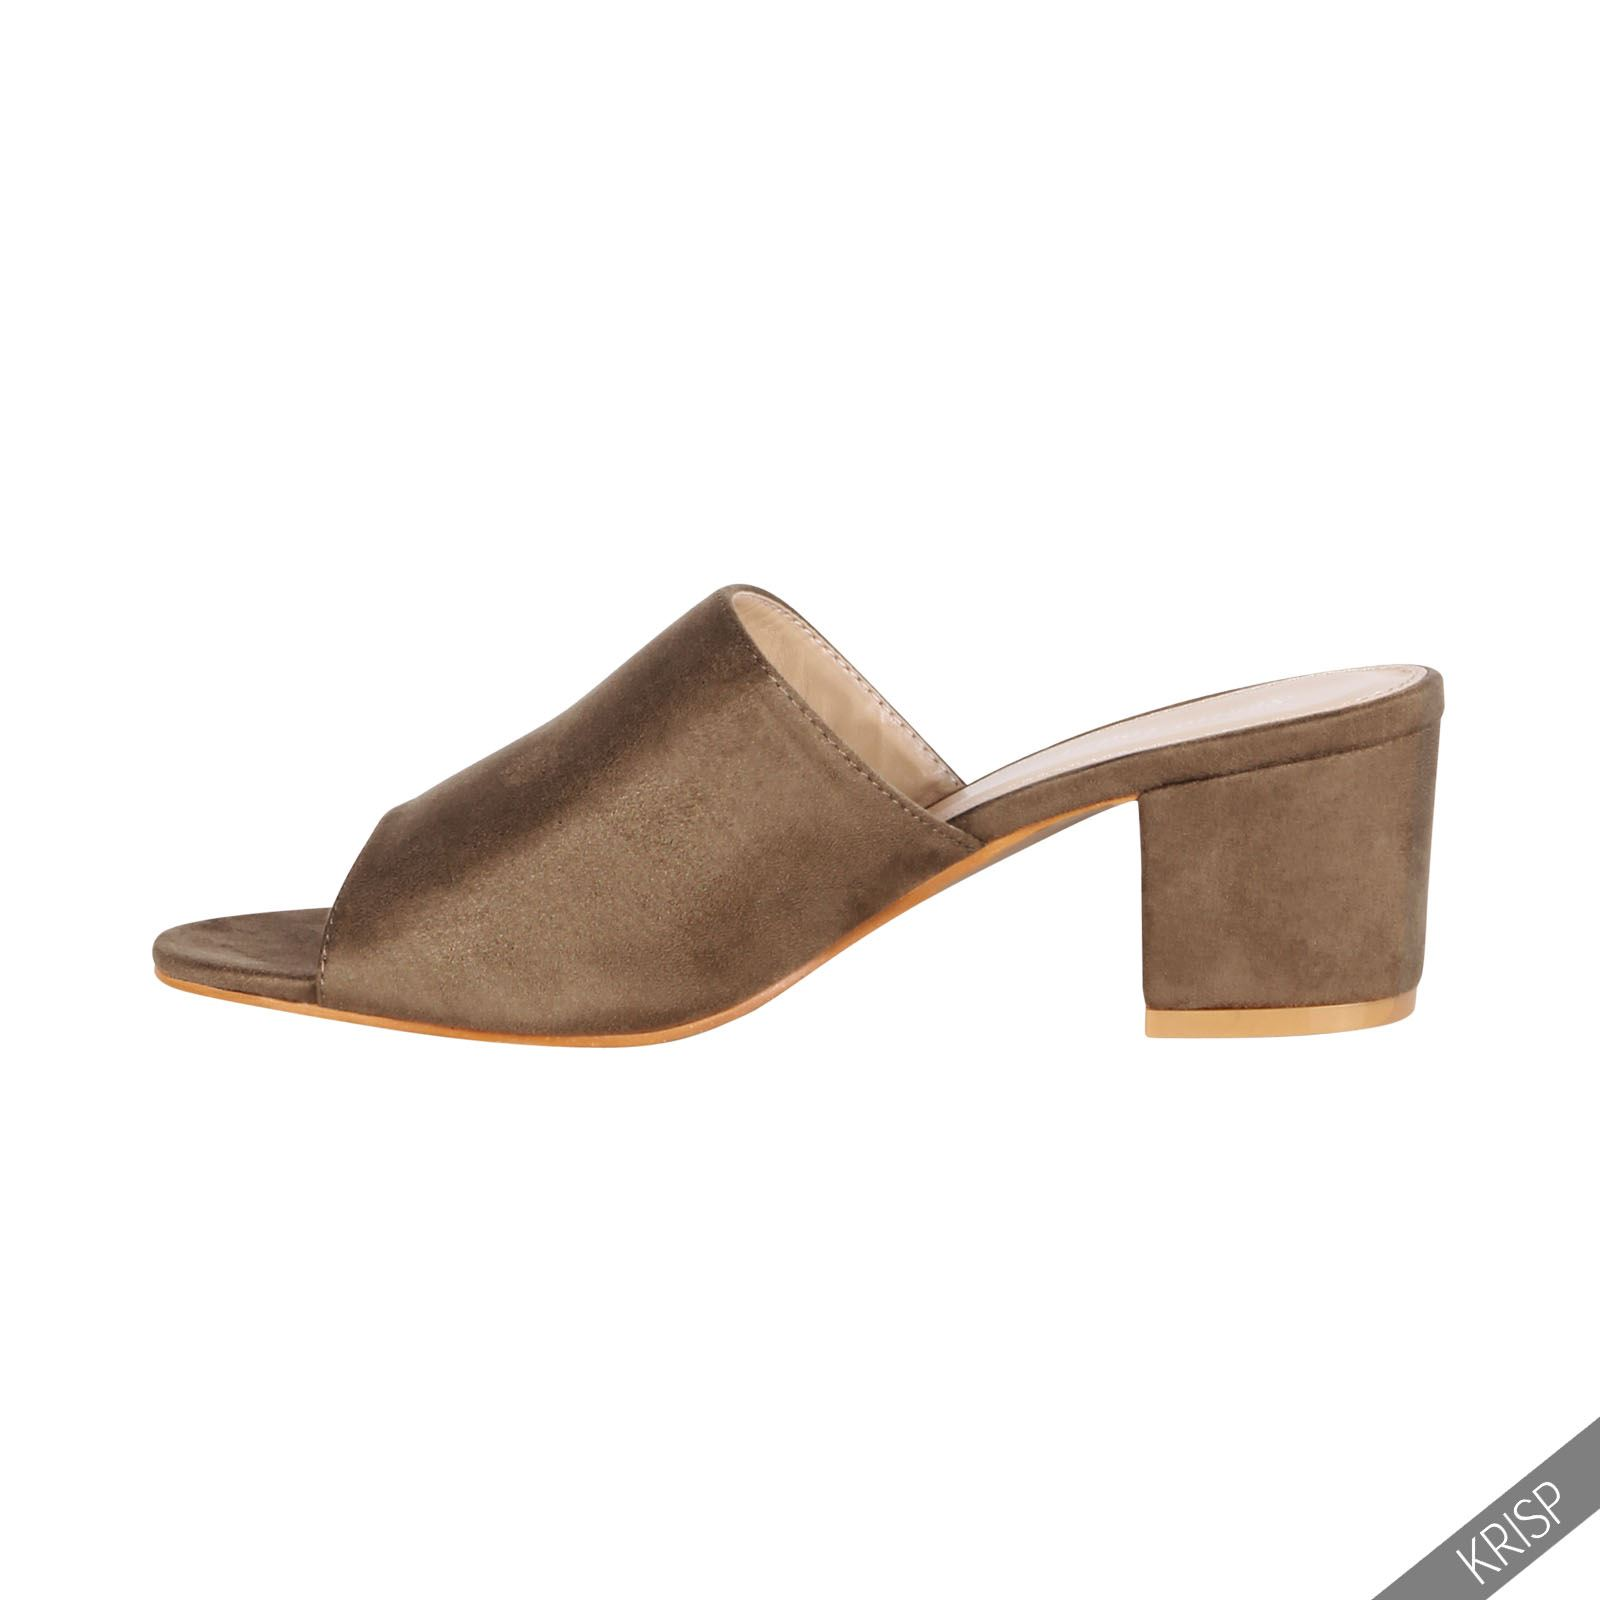 damen sommerschuhe mit absatz schuhe blockabsatz peeptoes high heels sandalen ebay. Black Bedroom Furniture Sets. Home Design Ideas